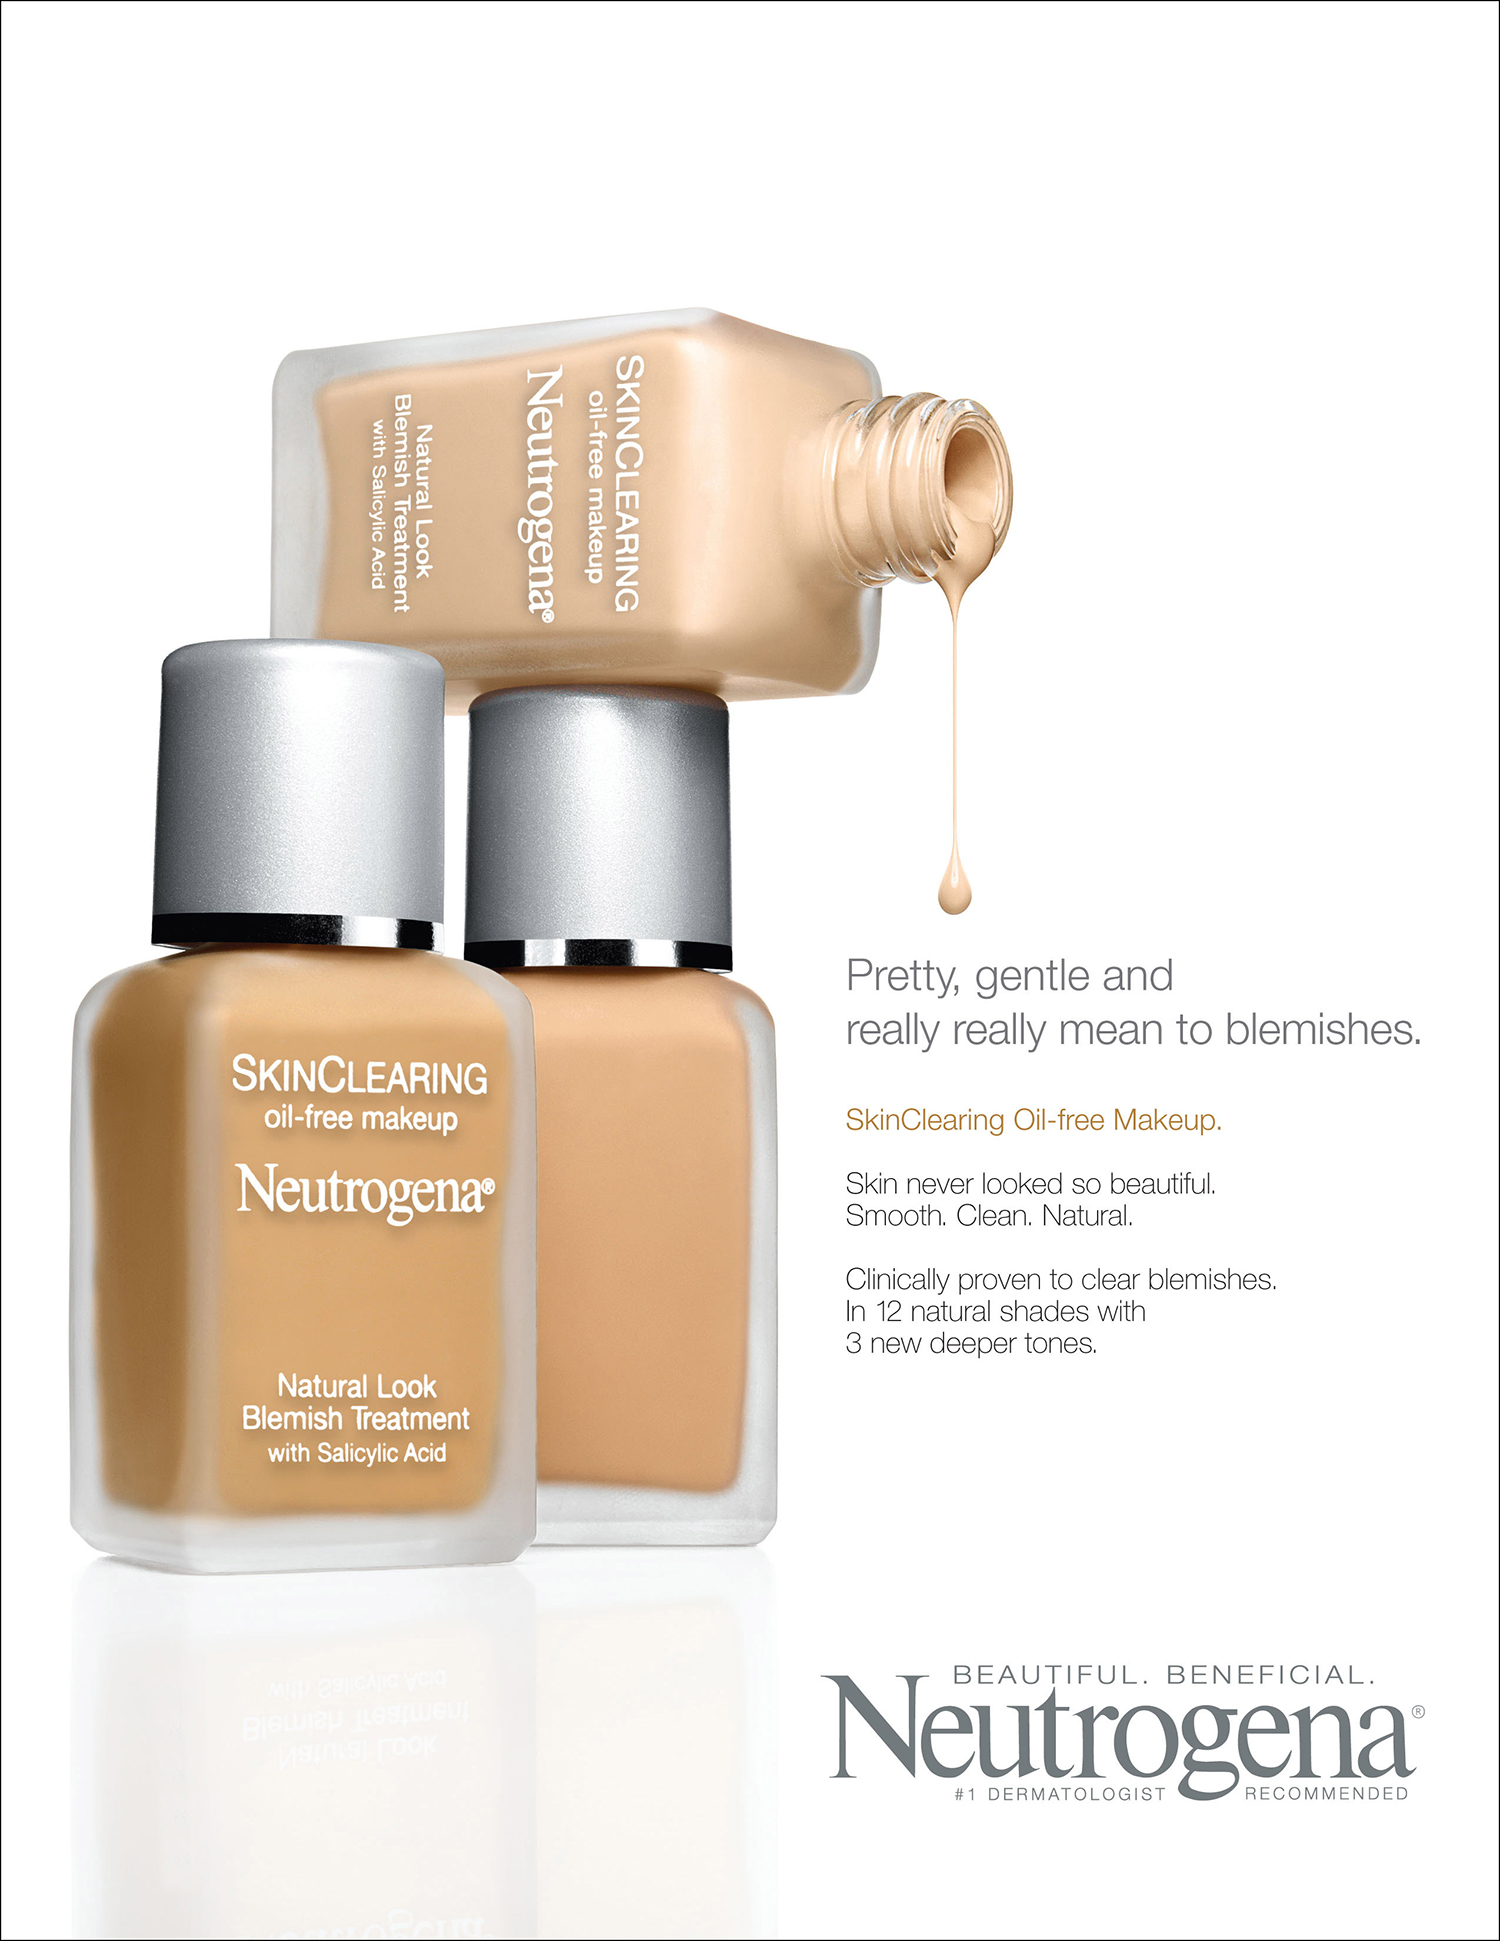 Neutrogena (Mean)